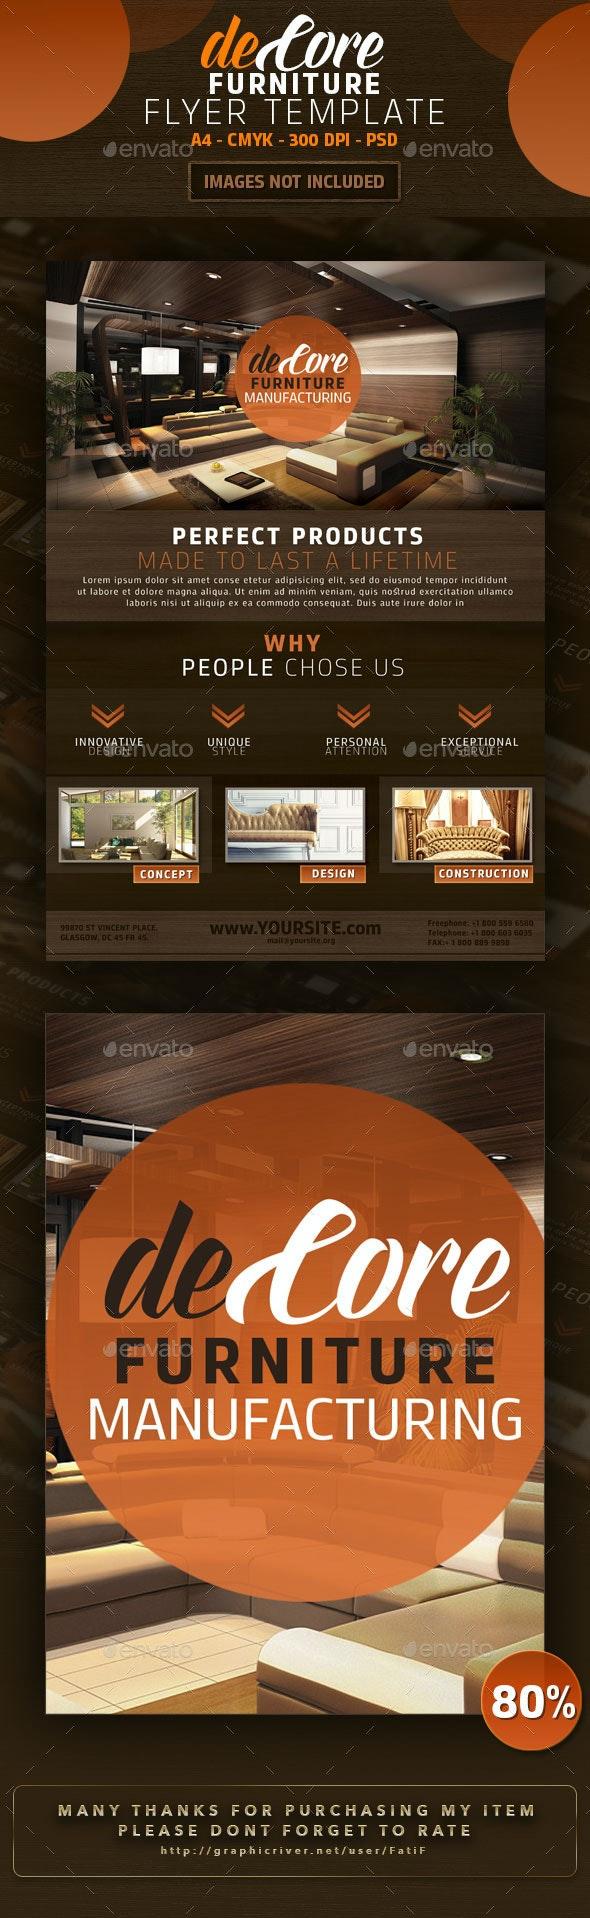 DeCore Furniture Flyer Template - Corporate Flyers